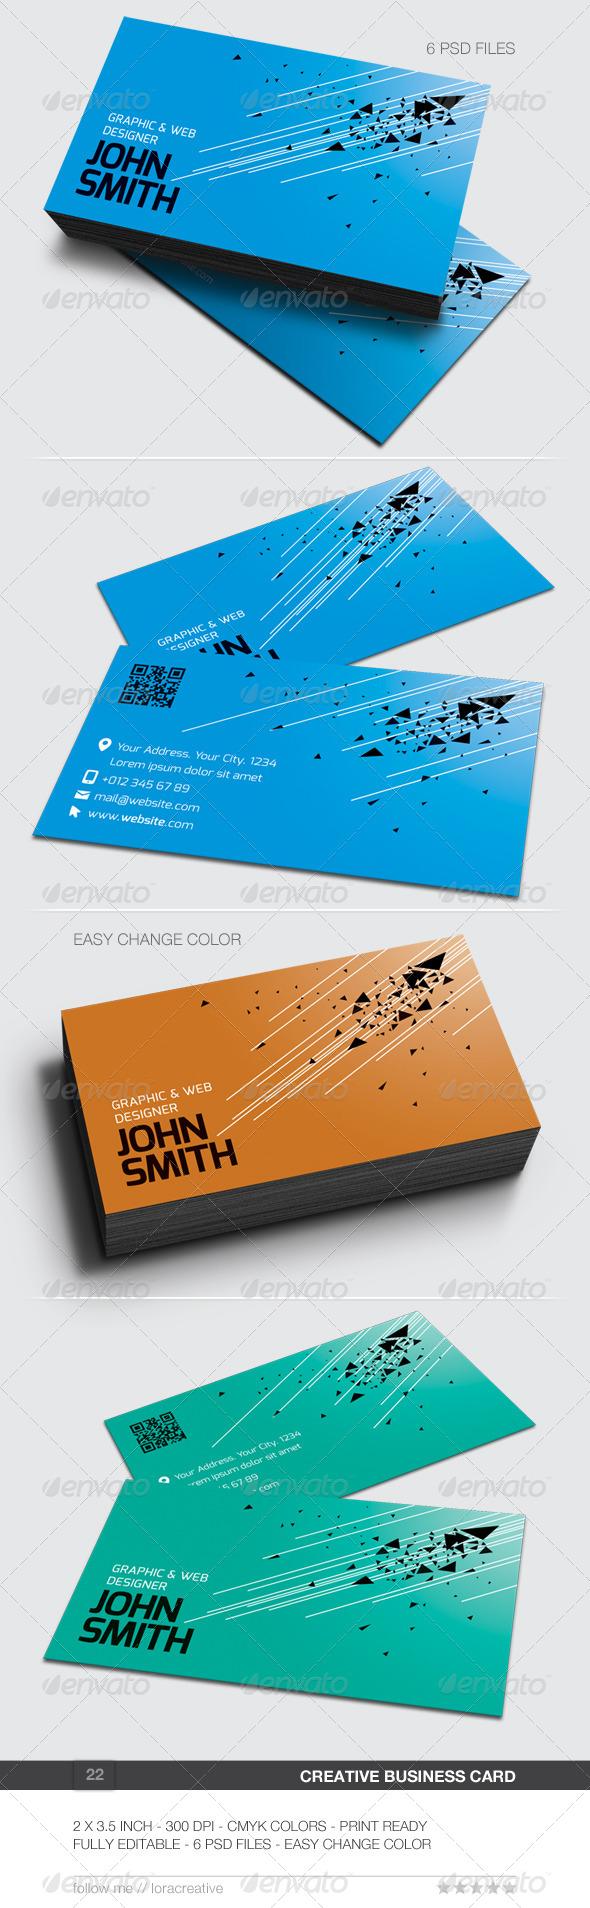 Creative Business Card - 22 - Creative Business Cards